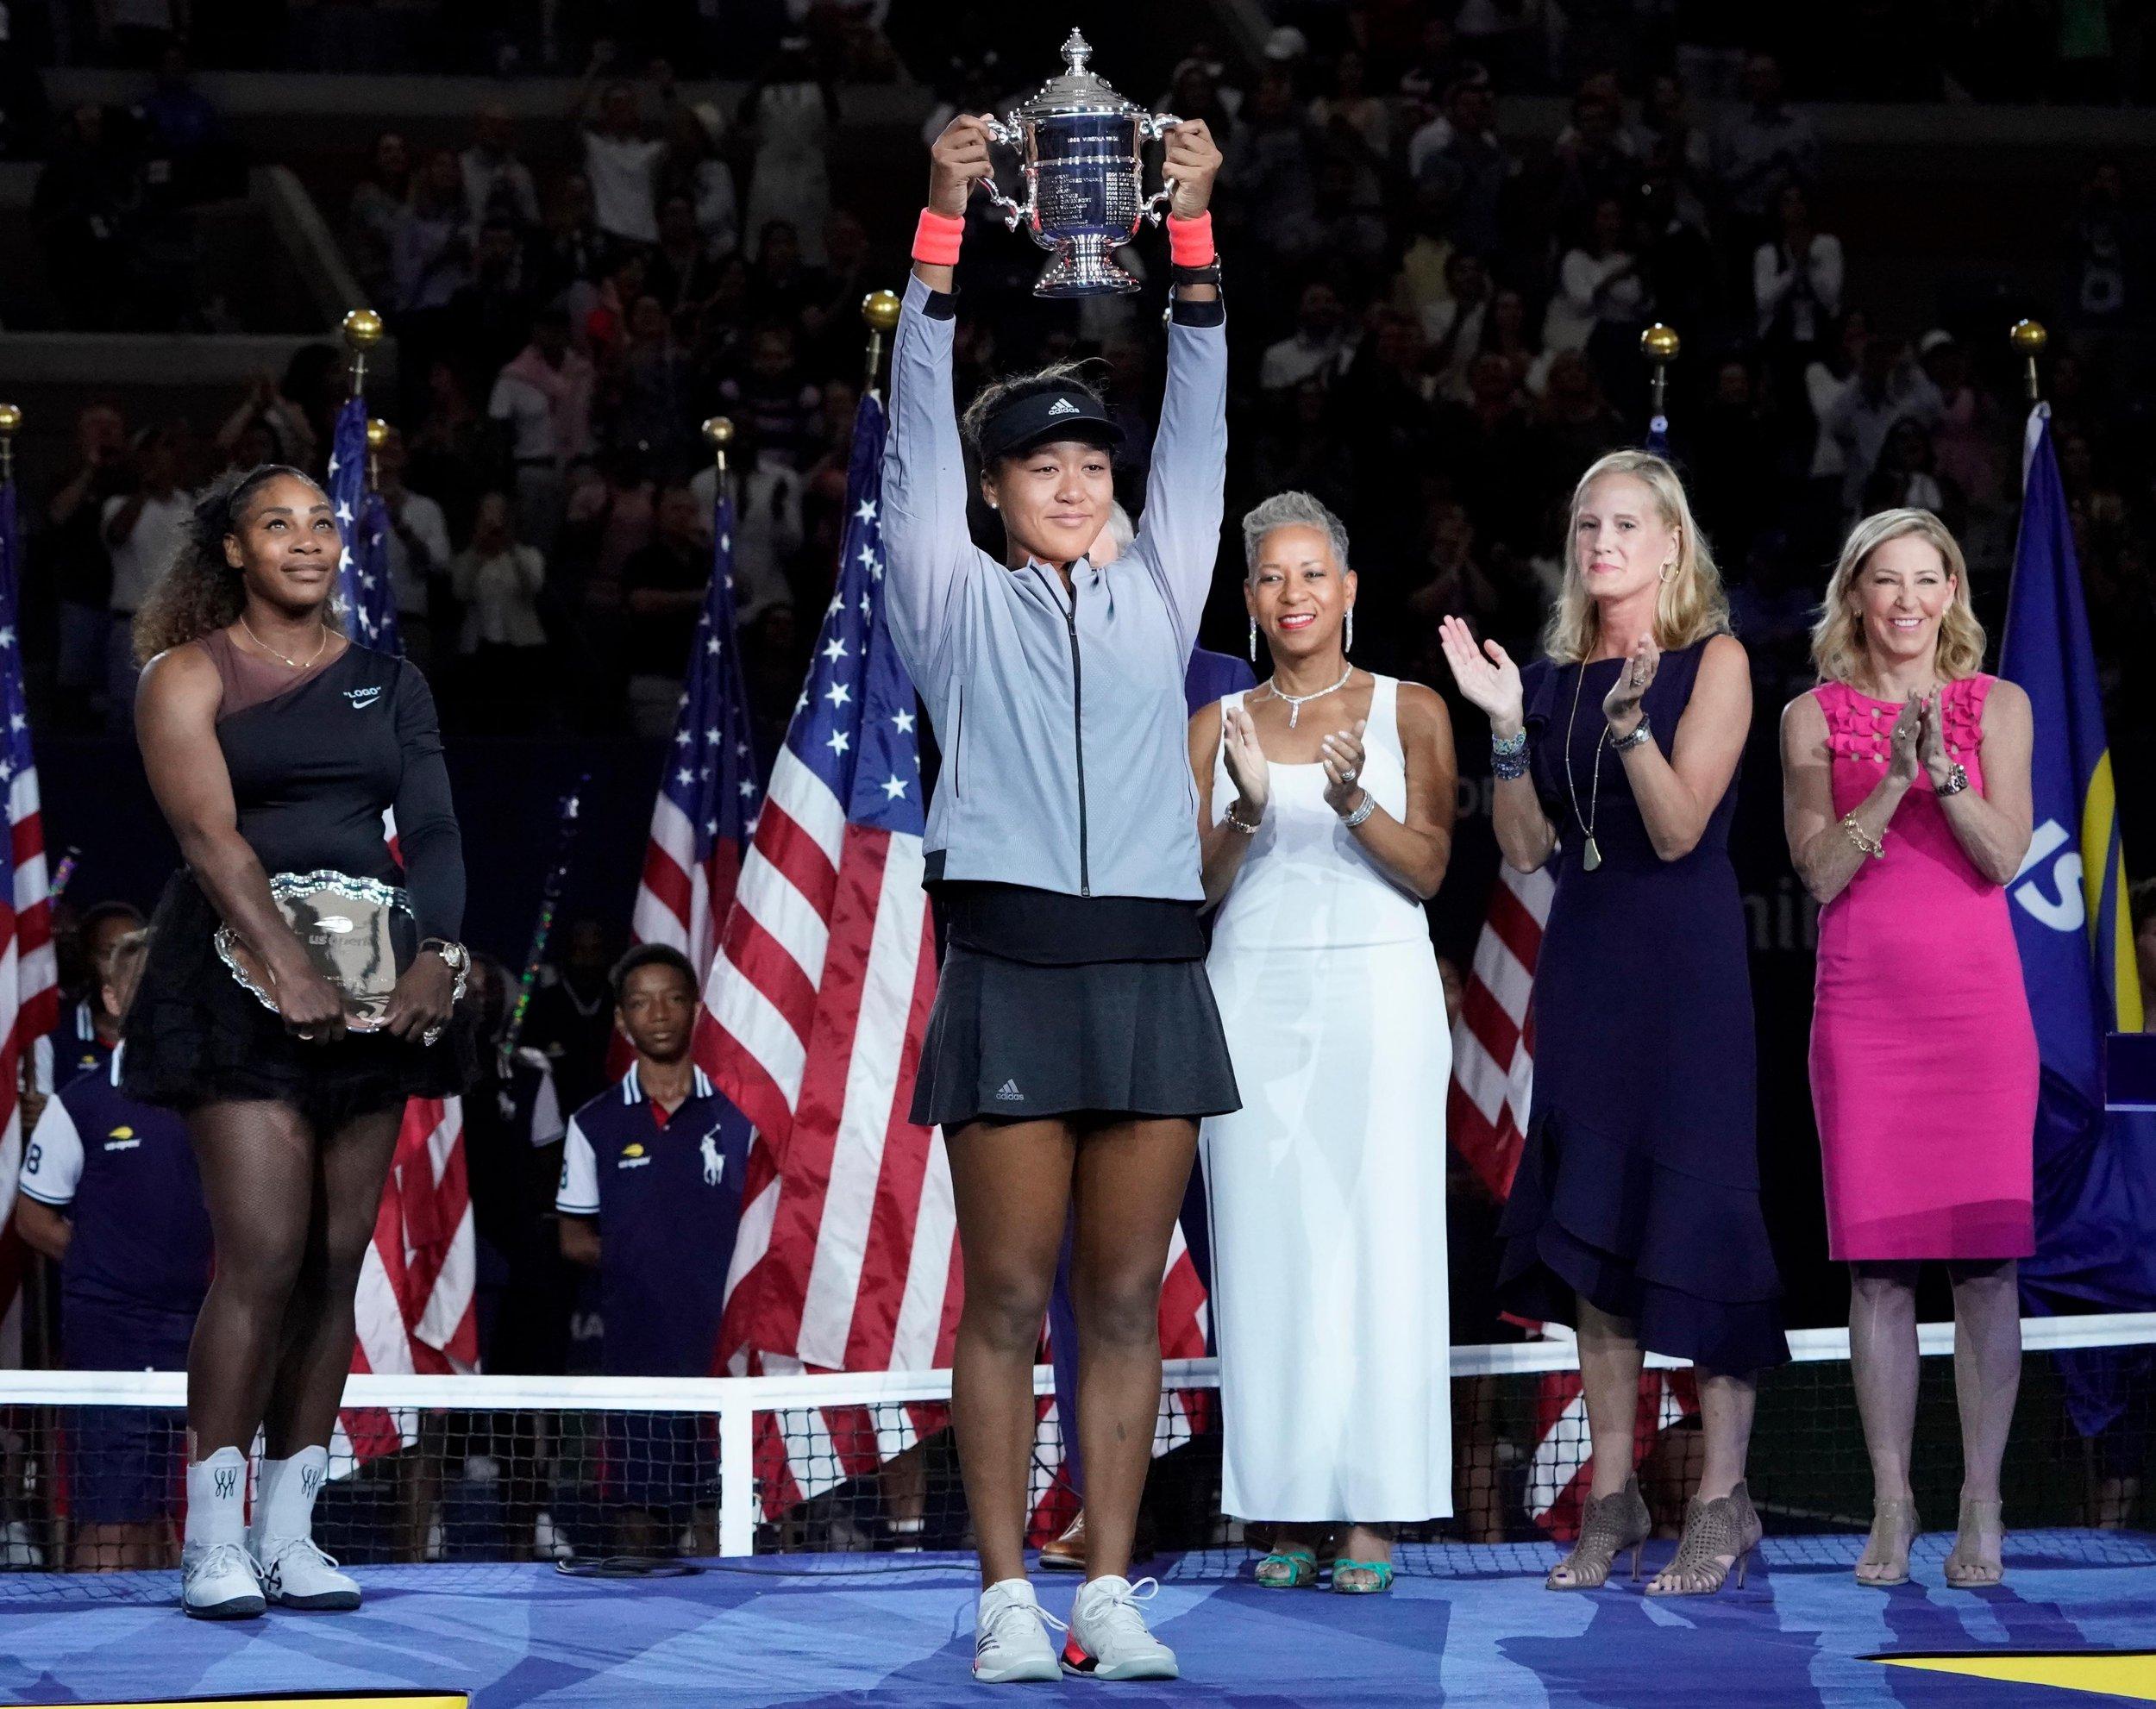 Naomi Osaka wins the US Open as furious Serena Williams has complete meltdown